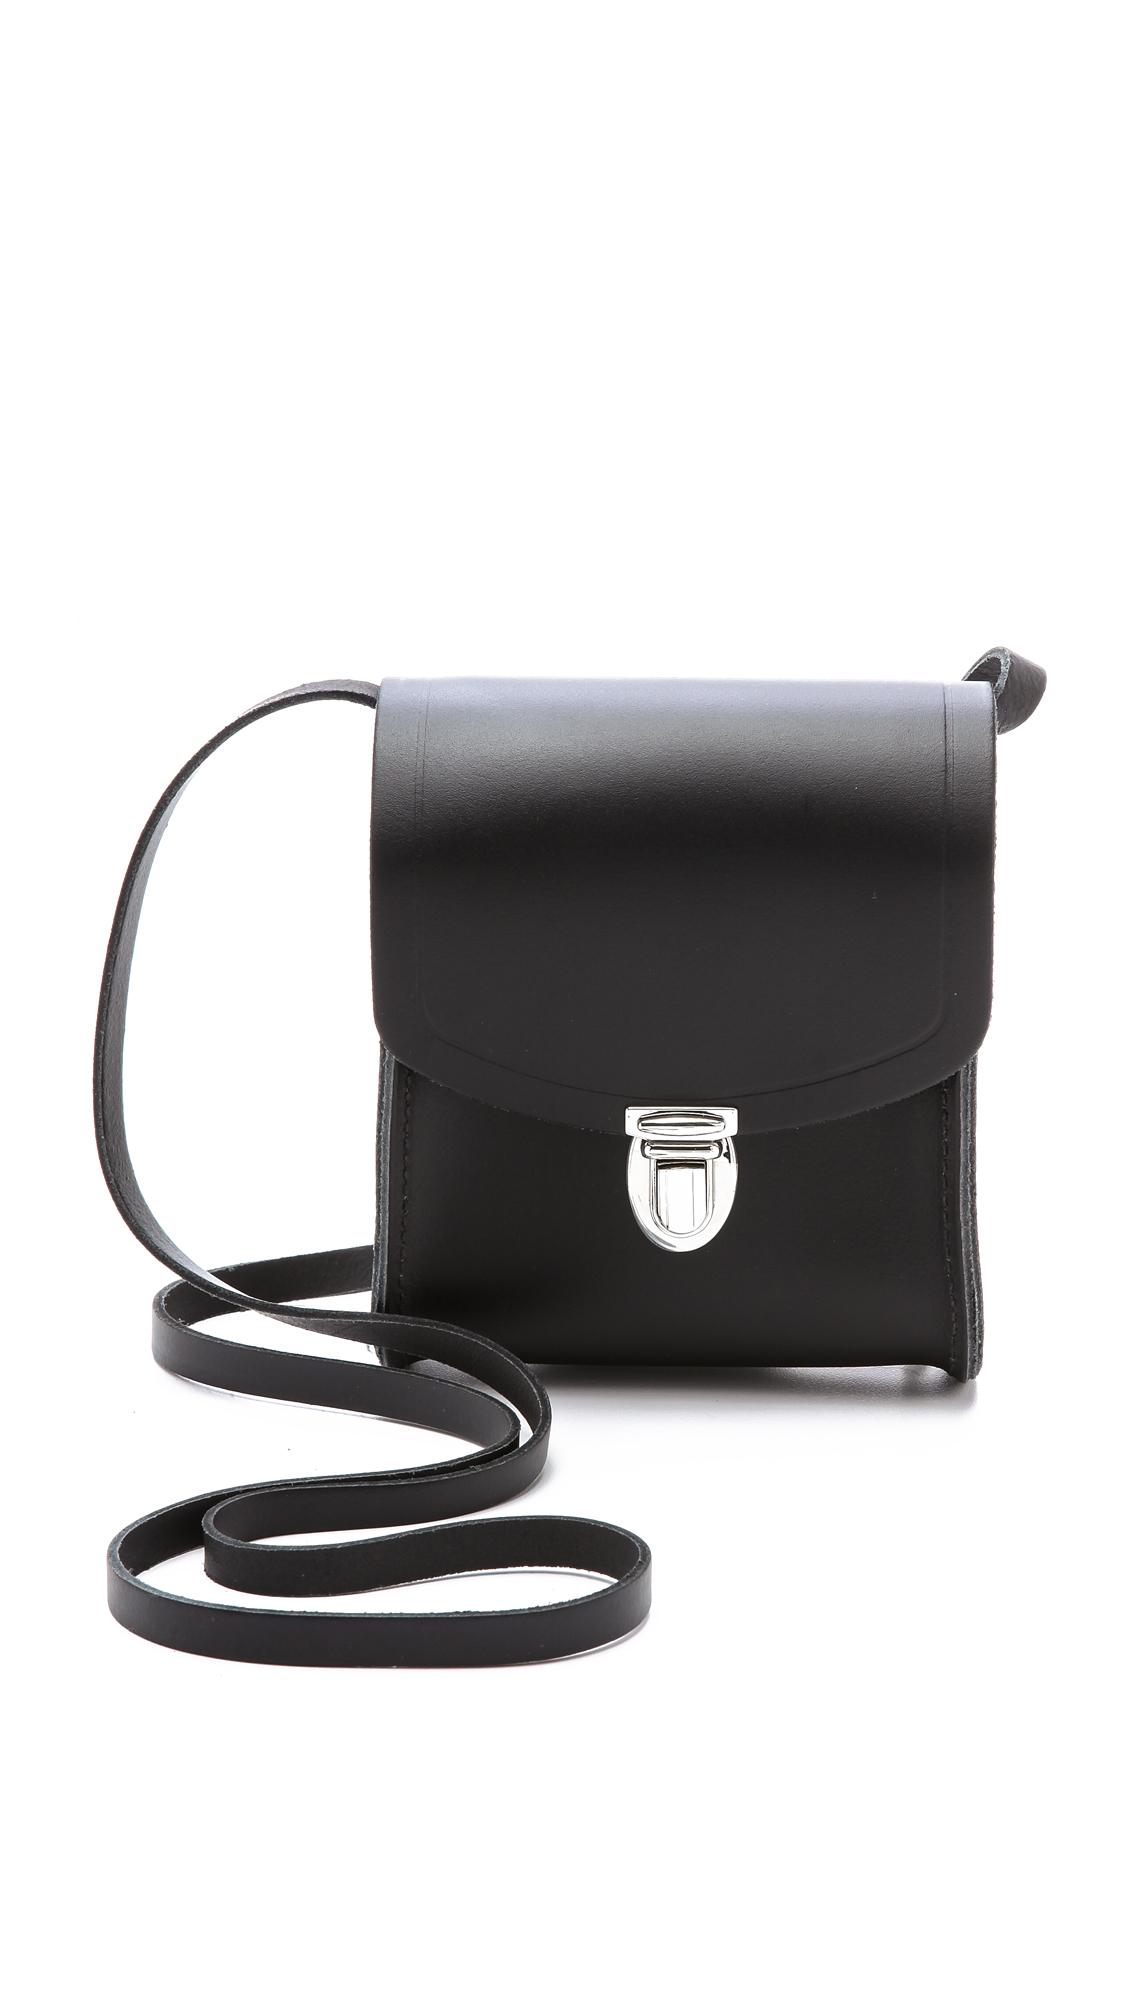 9ad67523428f Cambridge Satchel Mini Push Lock Bag